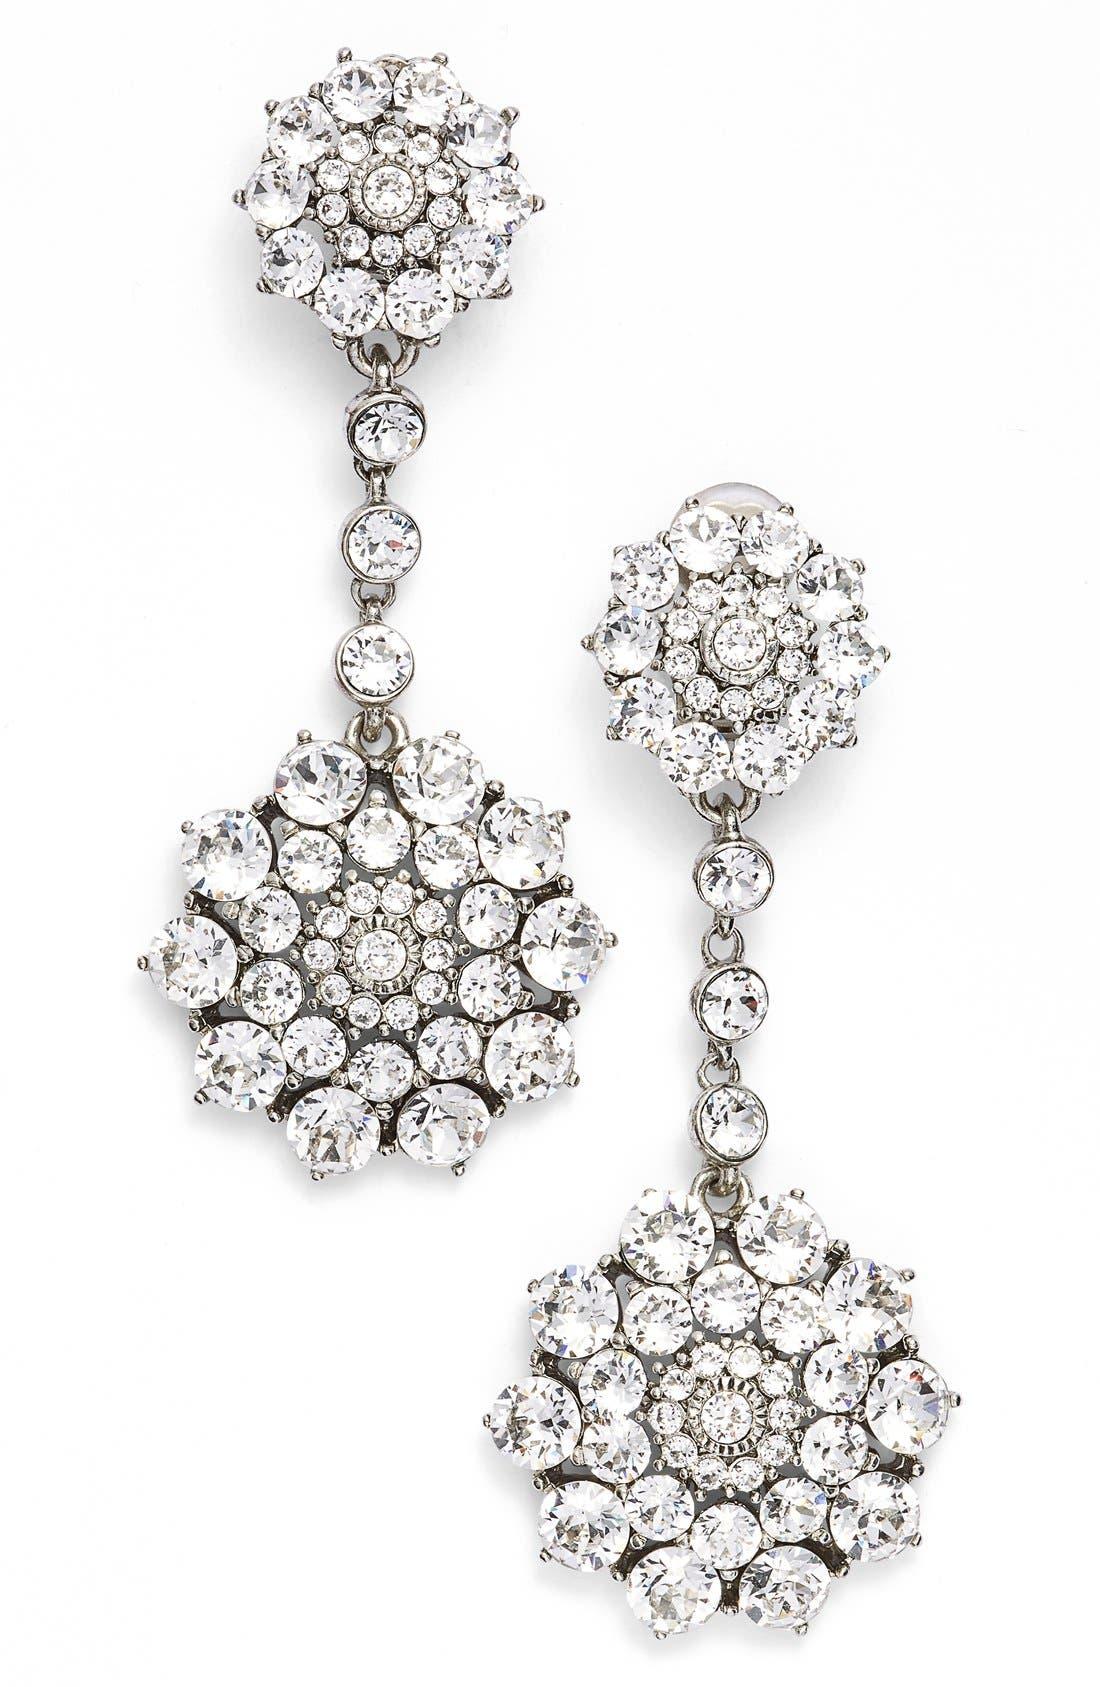 Main Image - Oscar de la Renta 'Classic Jeweled' Swarovski Crystal Drop Earrings